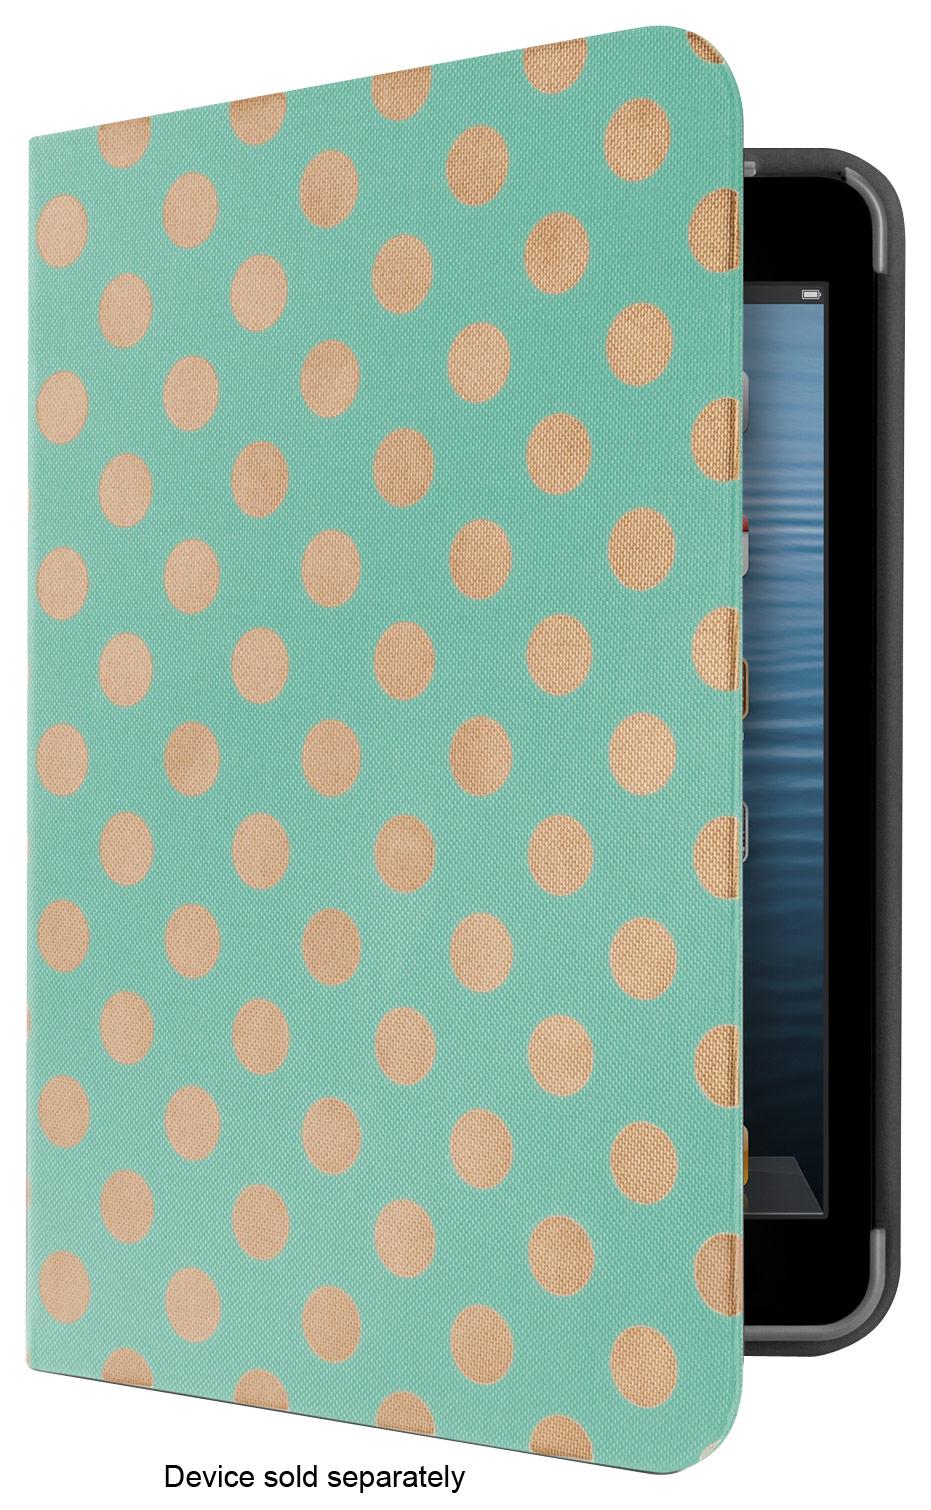 Belkin - FormFit Coverlet for Apple® iPad® mini and iPad mini with Retina display - Teal/Tan